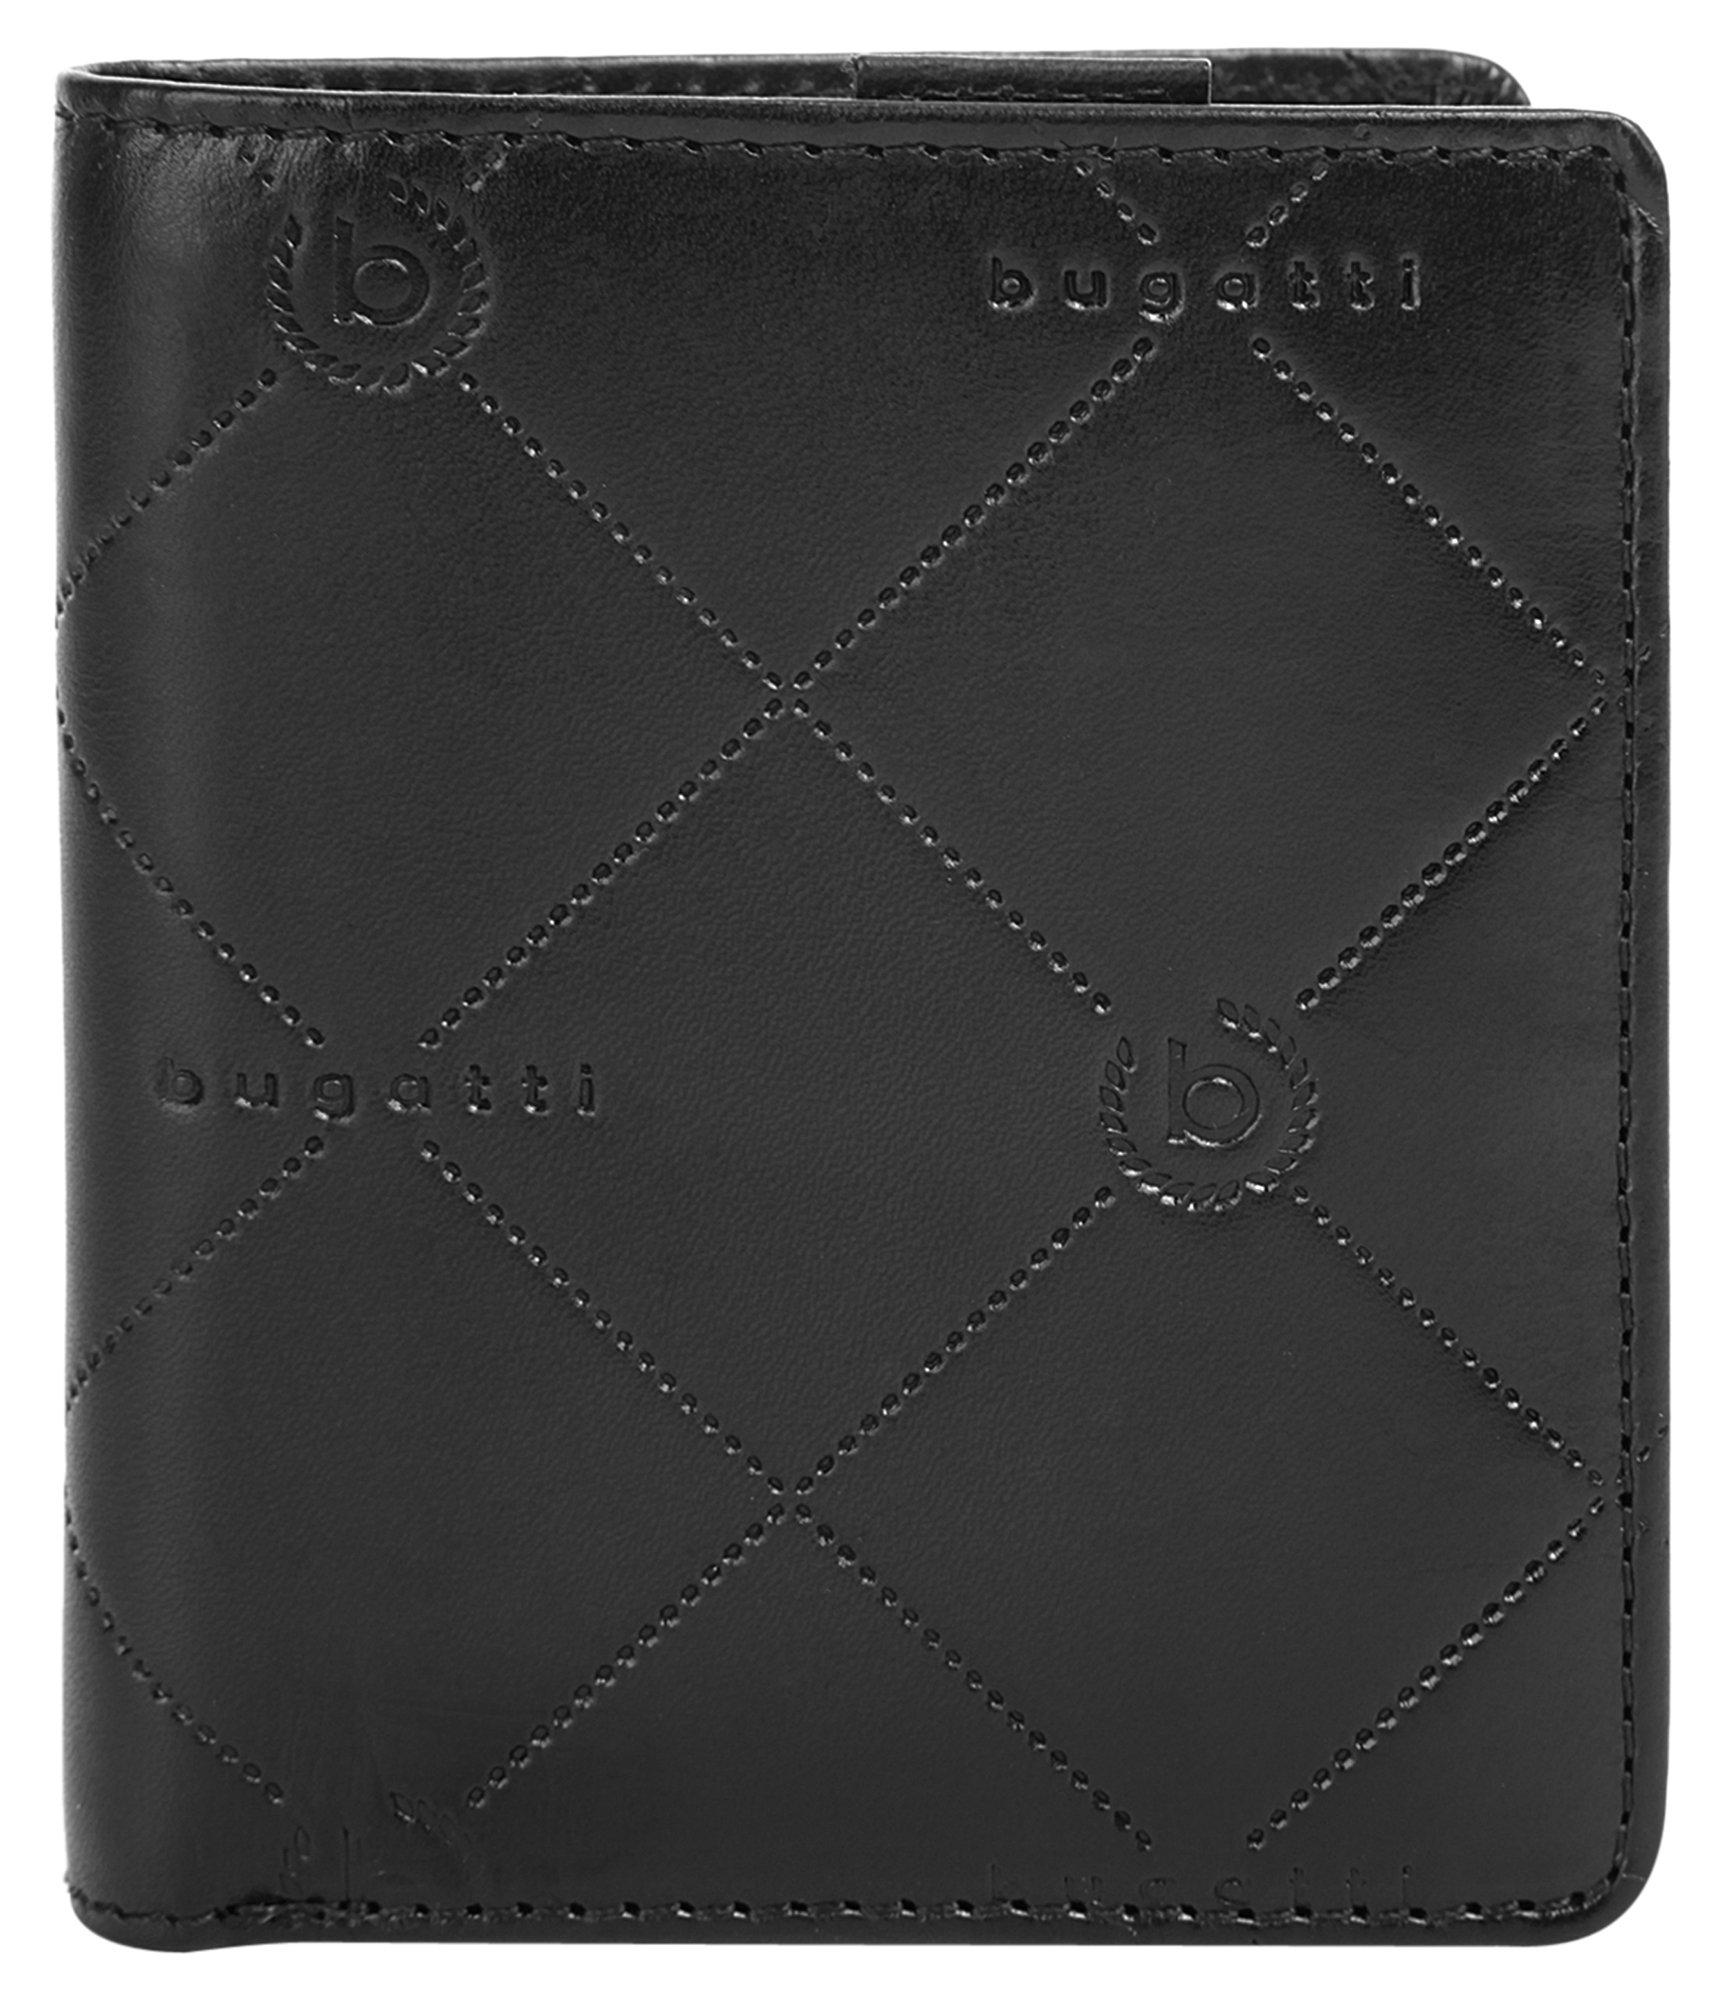 Bugatti portemonnee »DOMUS NOBILE RFID« - gratis ruilen op otto.nl